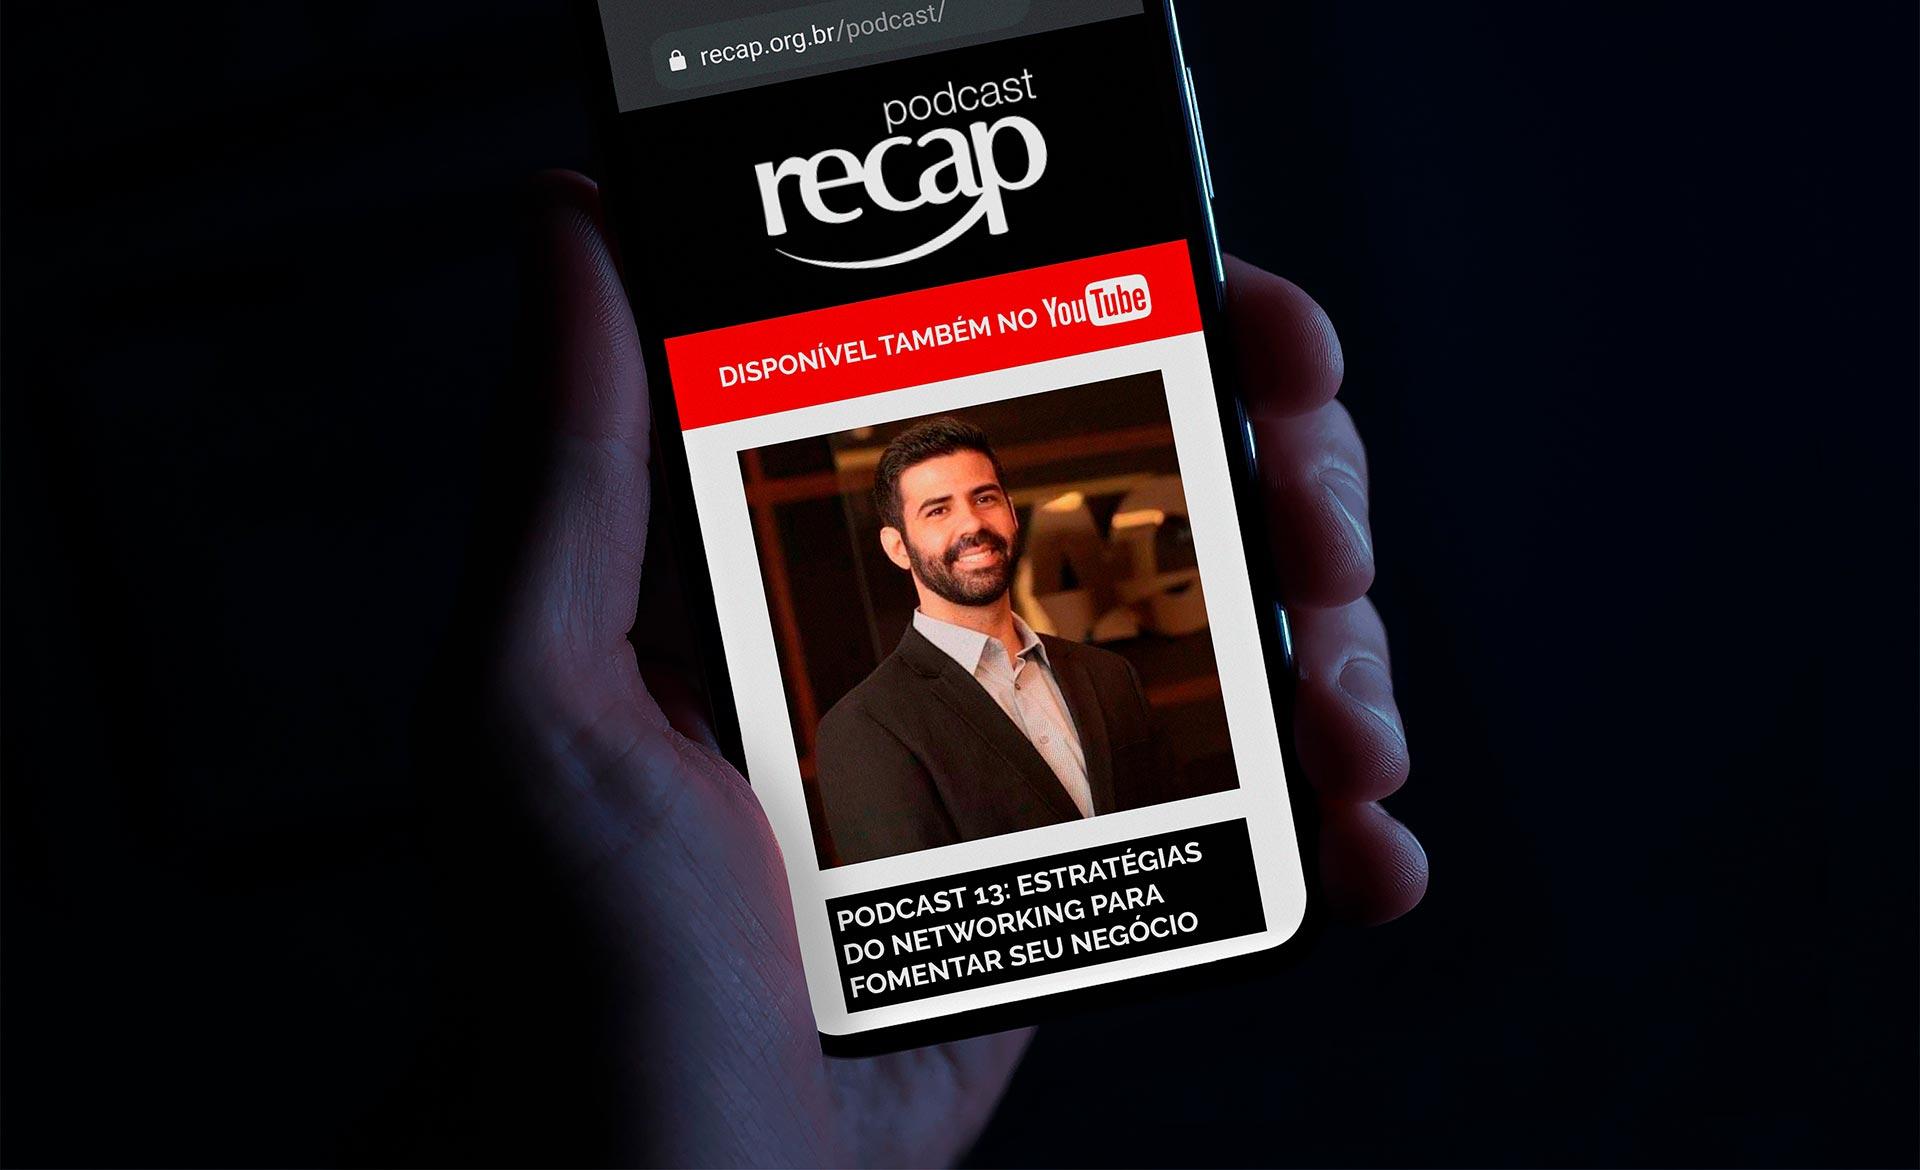 RECAP PODCAST